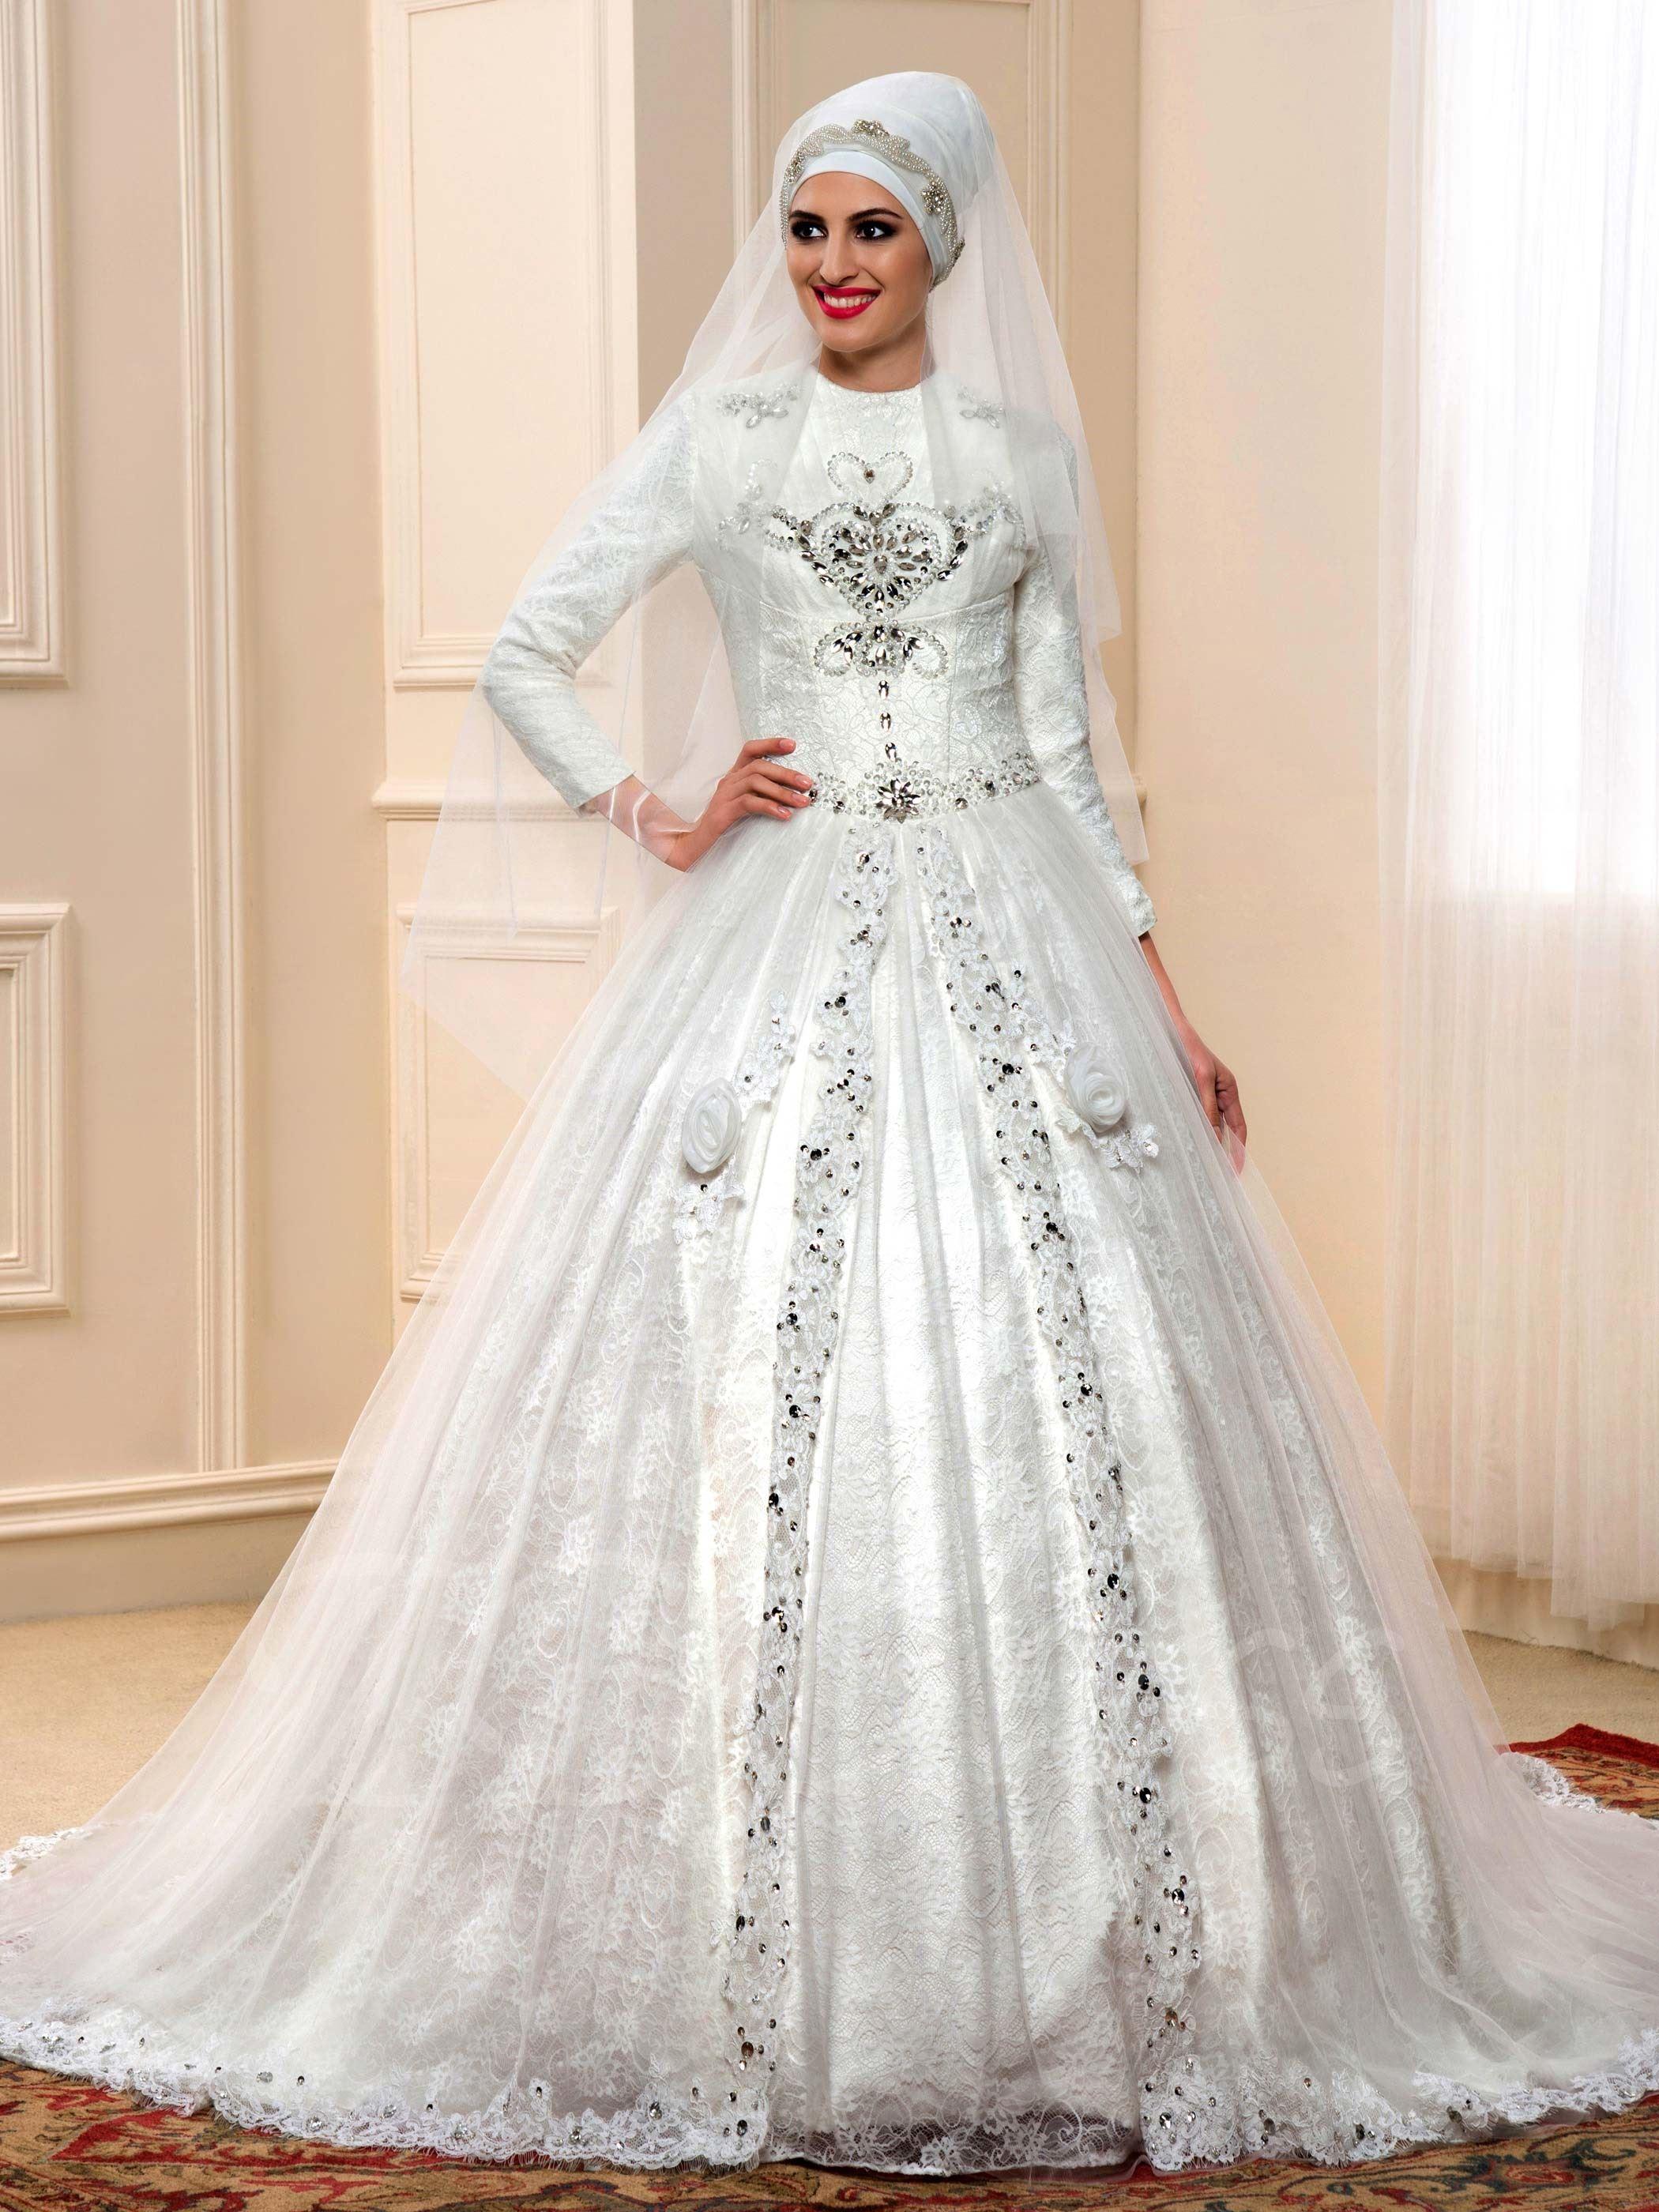 بالصور صور فساتين زواج , اجمل فستان فرح لاجمل عروسة 1070 4